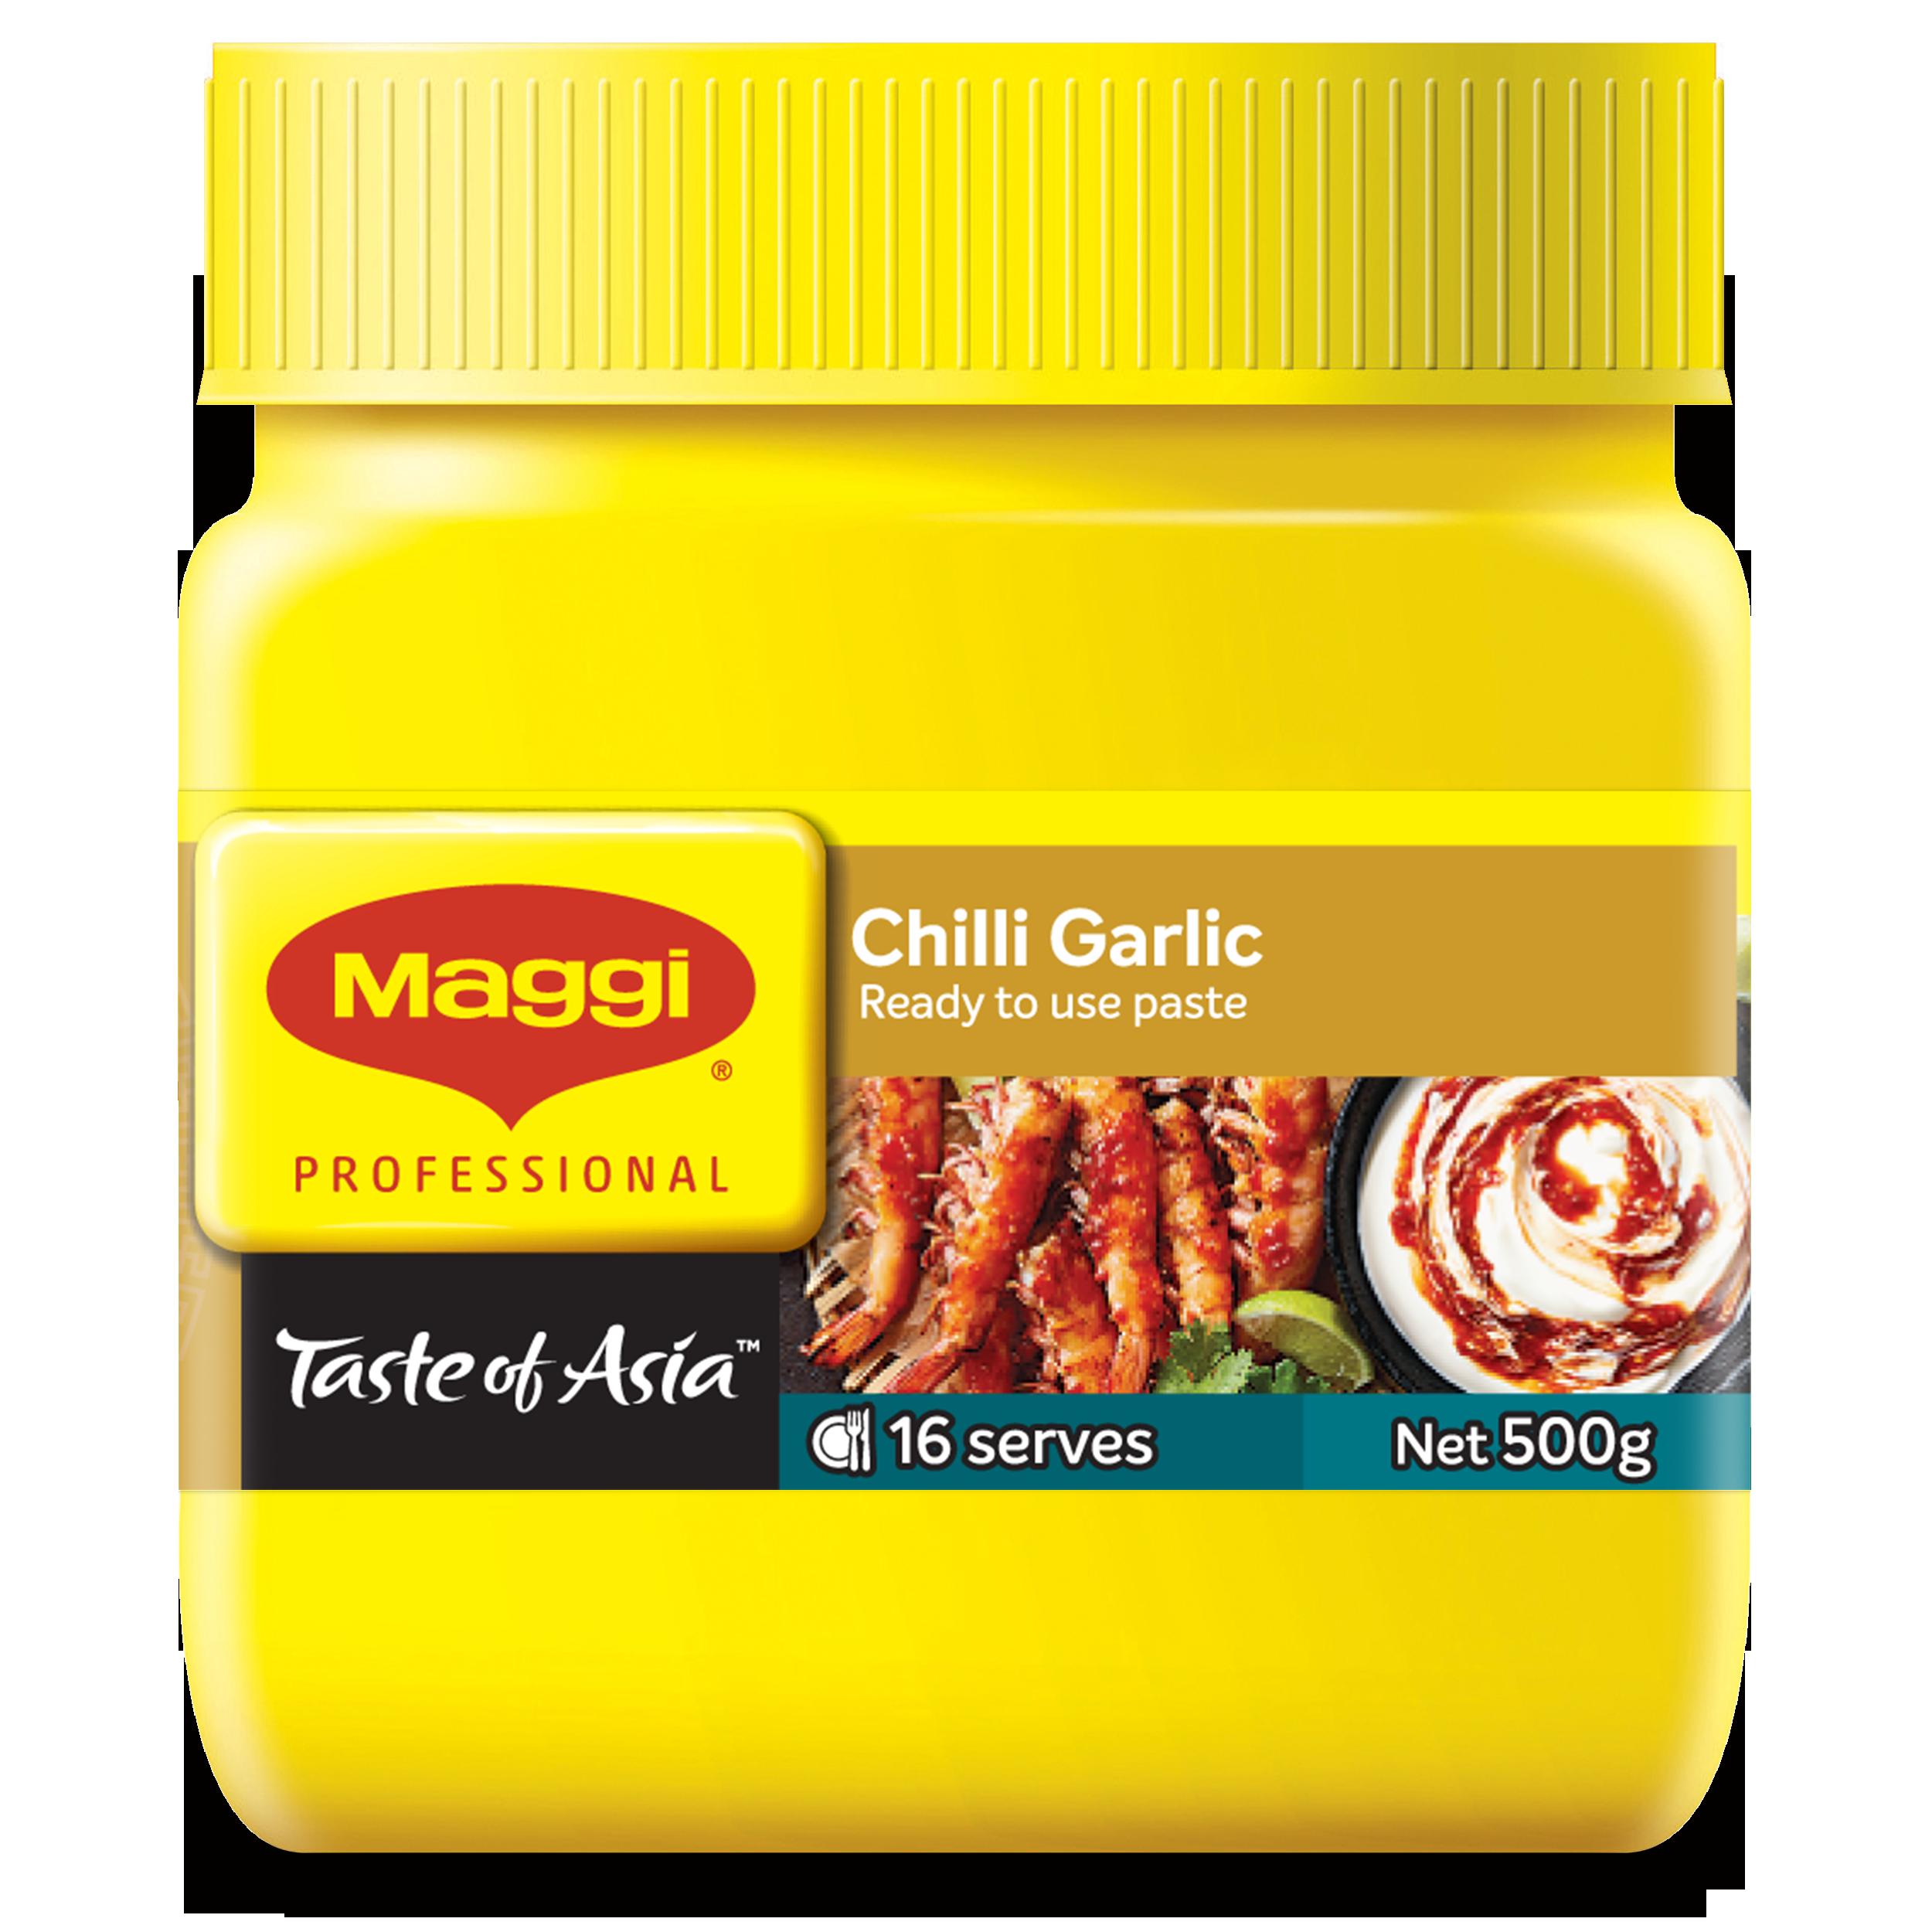 12386742 MAGGI TASTE OF ASIA Chilli Garlic Paste_500g.png